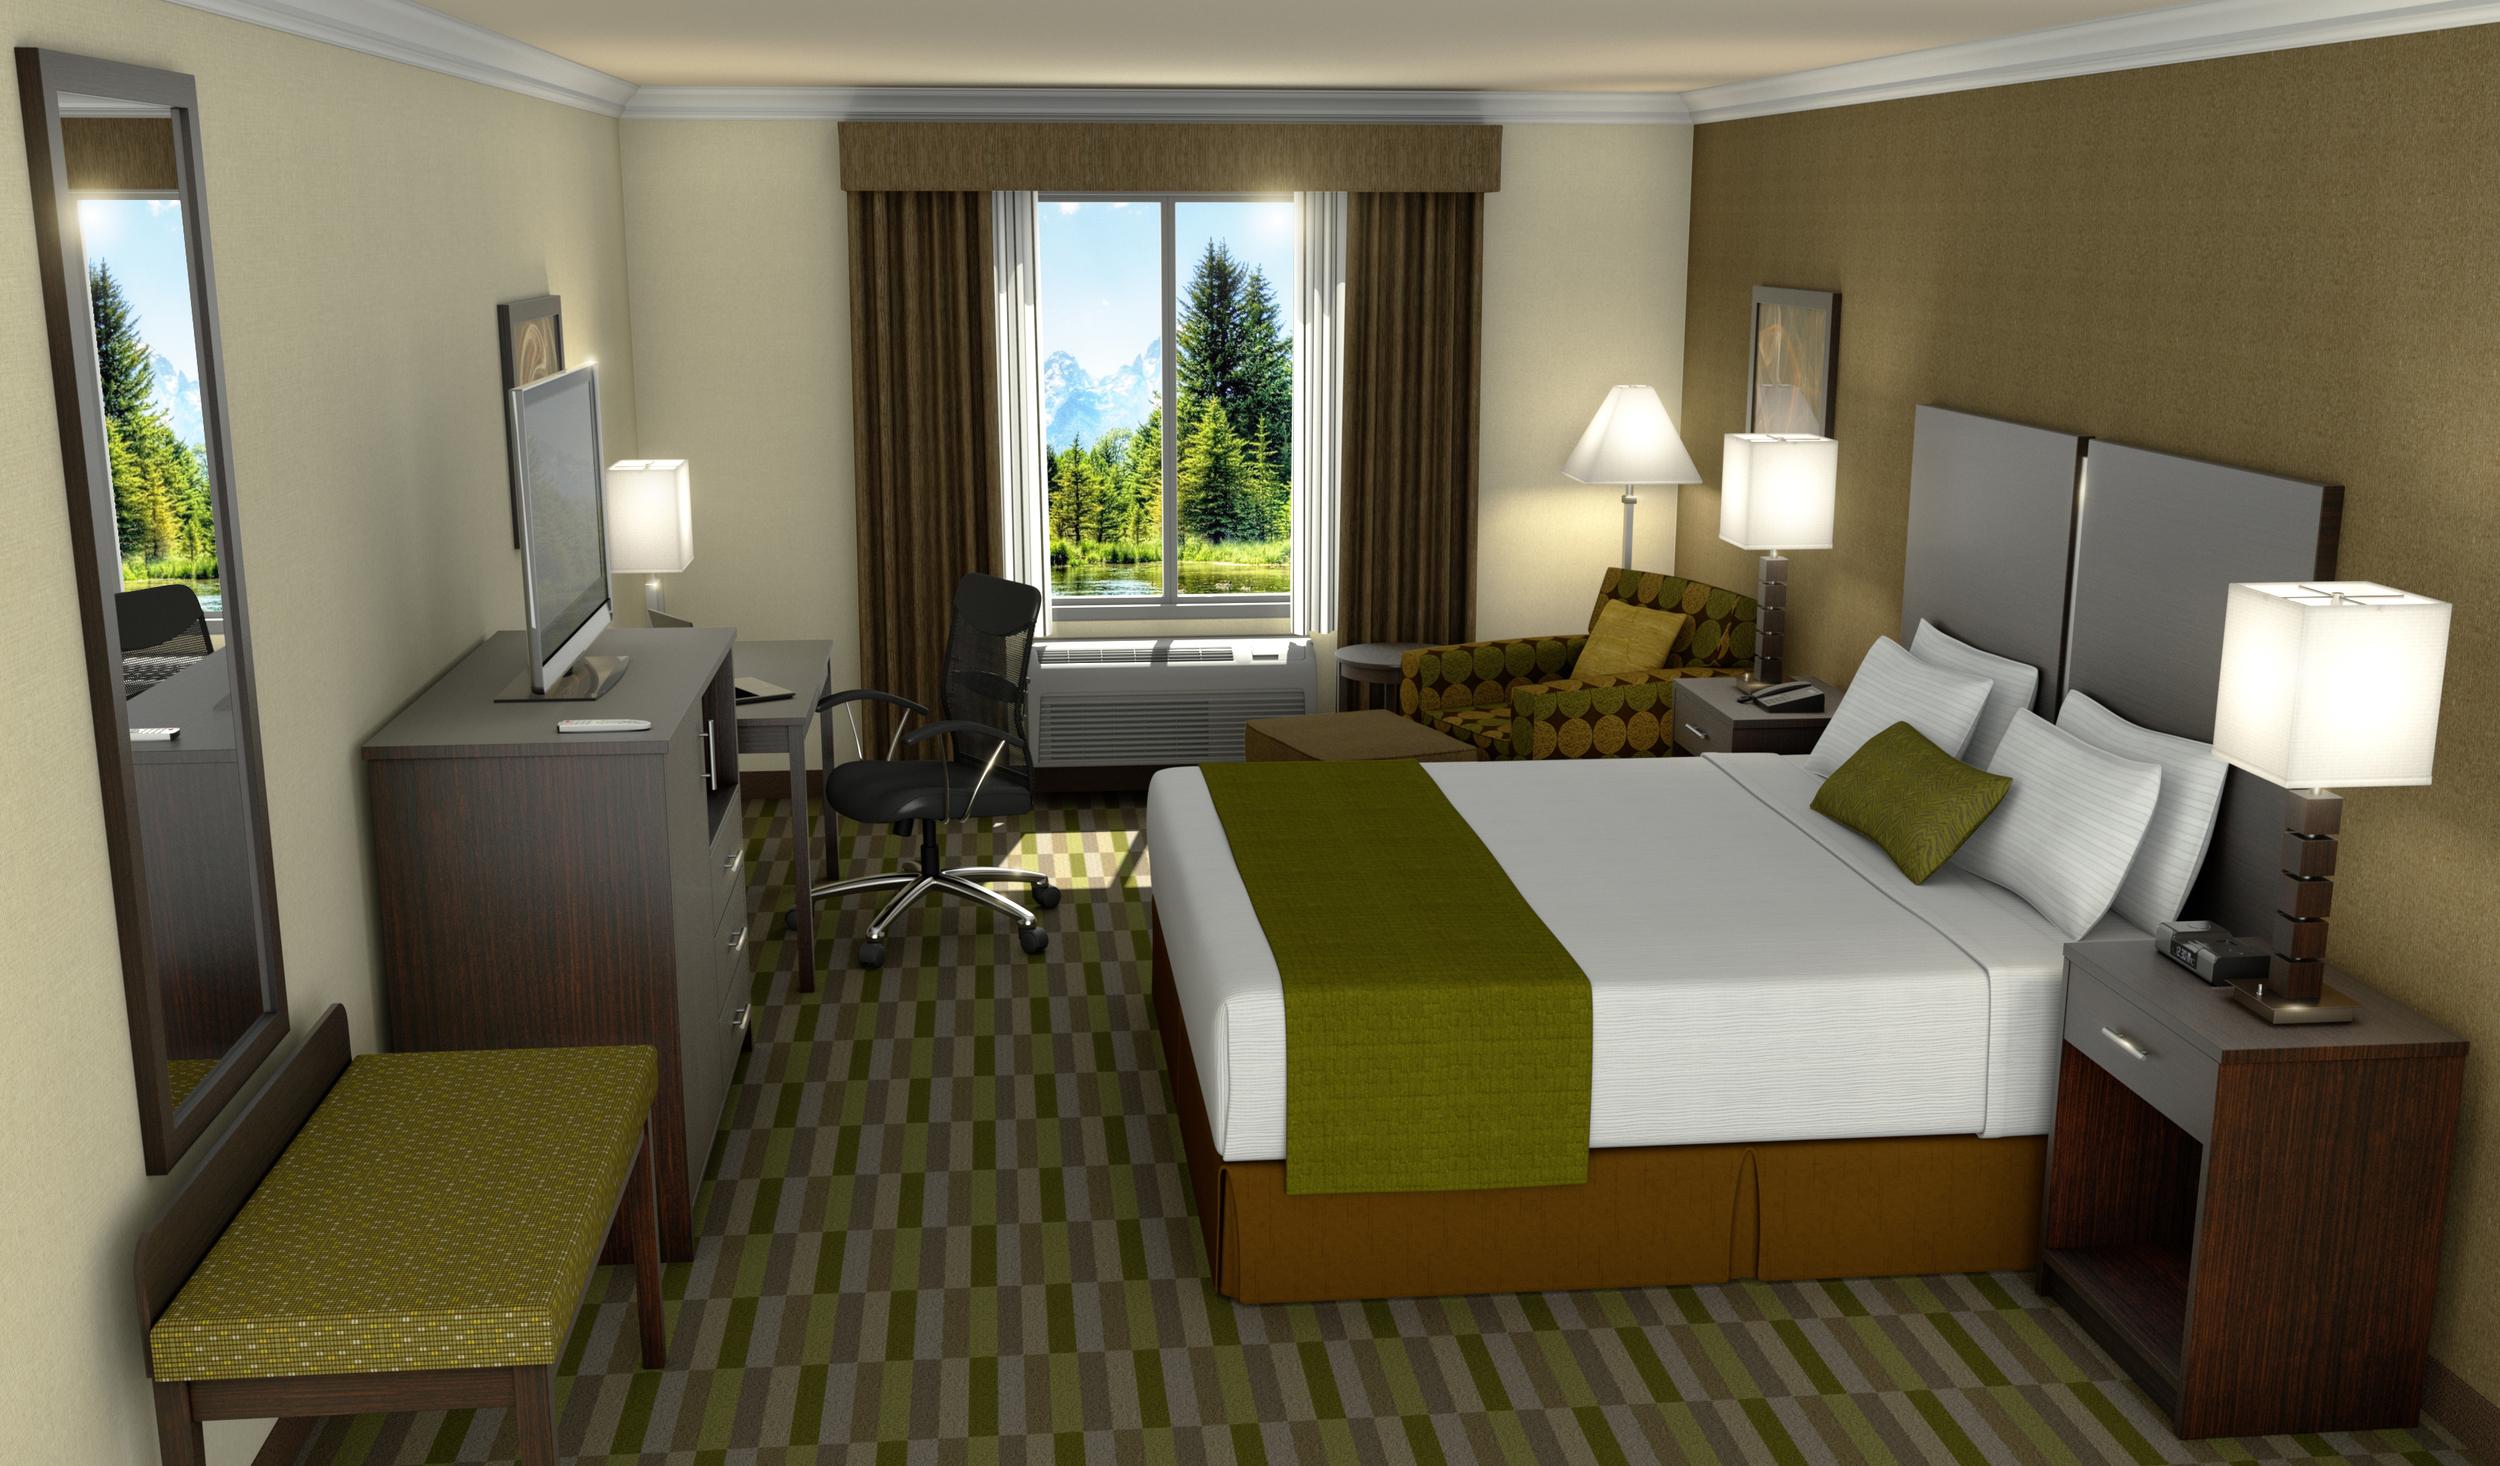 asteriskos-design-cg-render-bestwestern-hotel-realistic-photorealistic-interior-architecture-wide.jpg